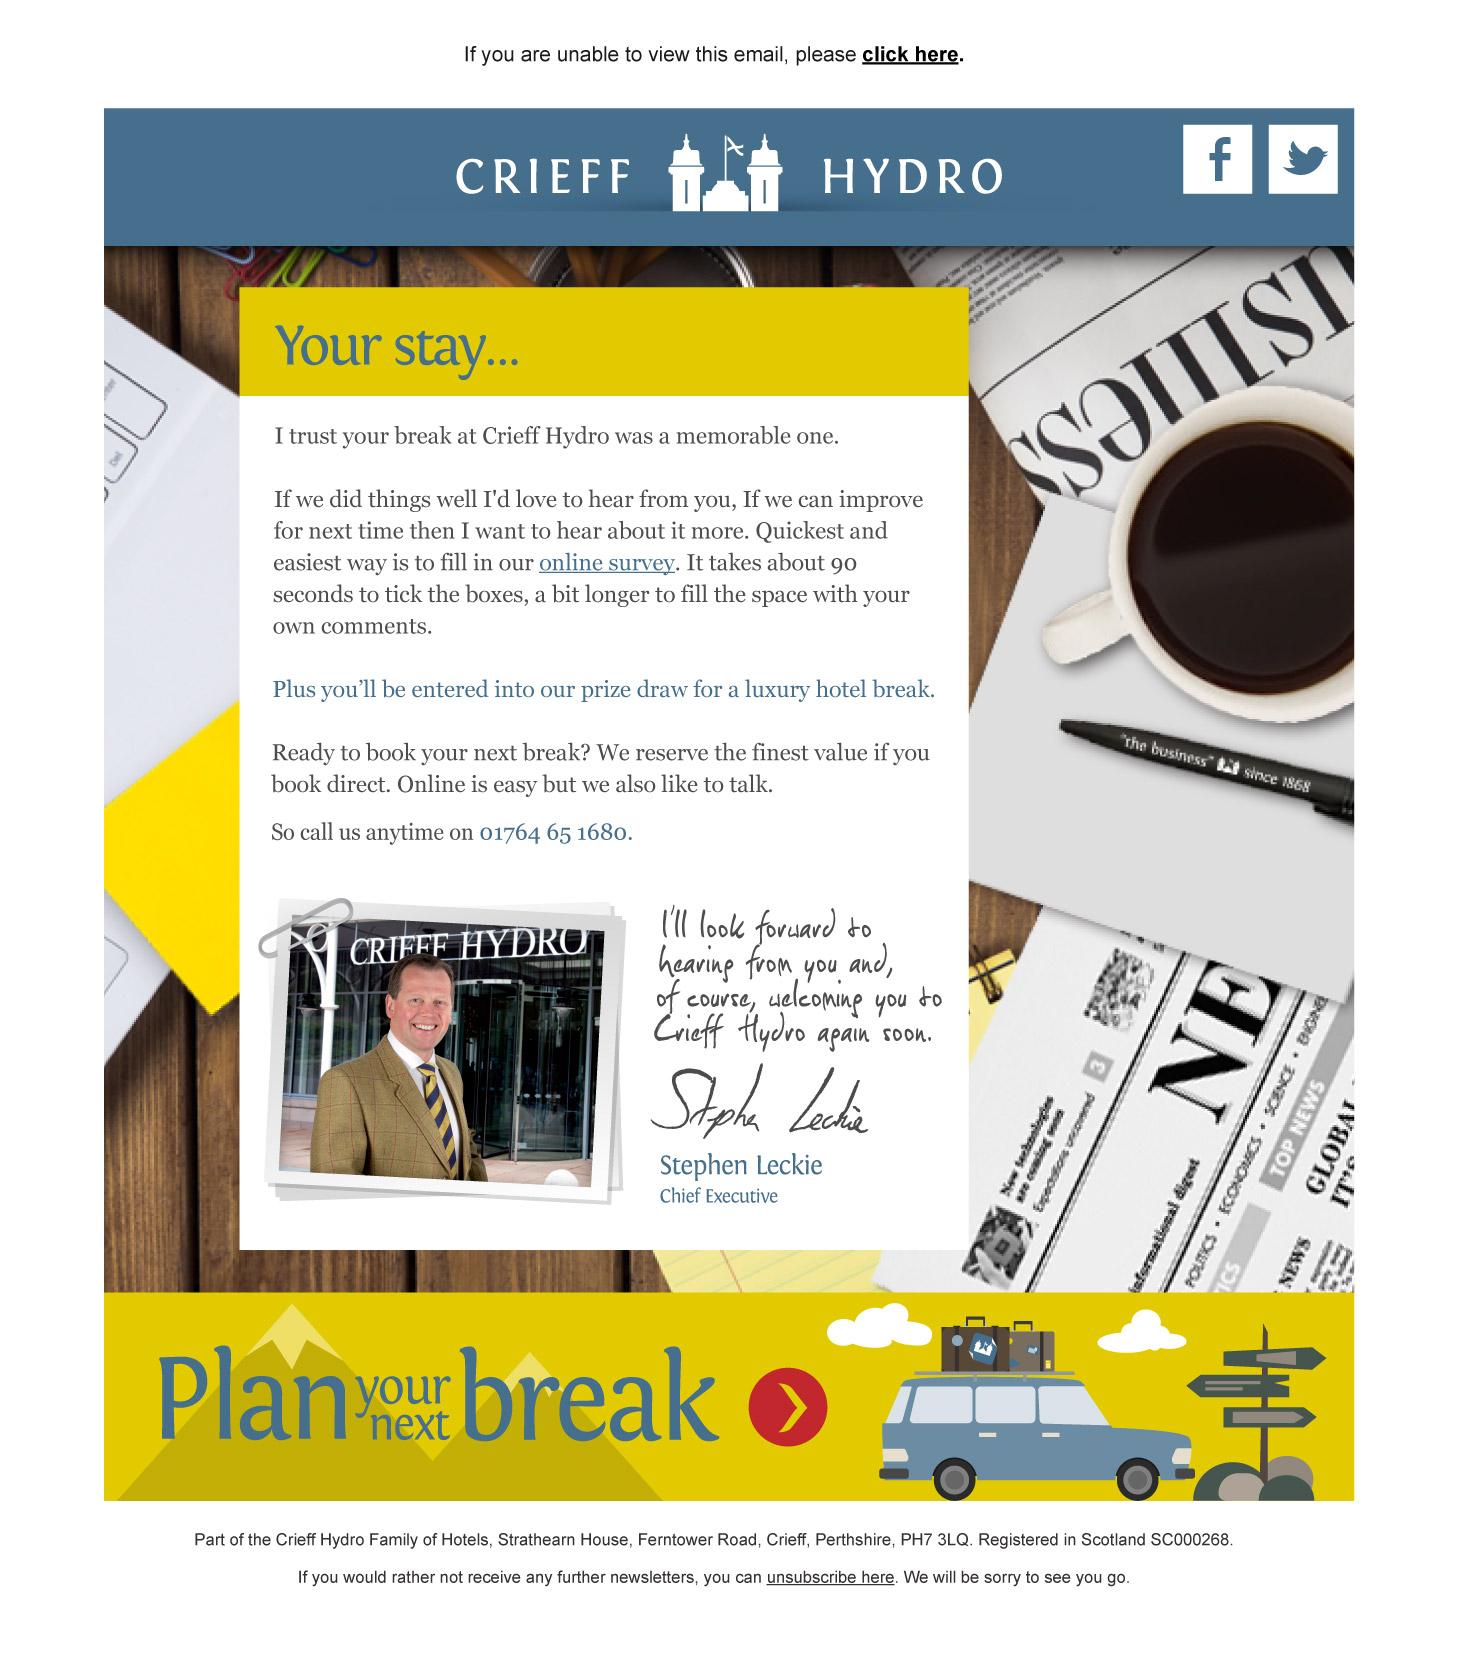 CH0705_Crieff_PostStay_Email_Nov2015_Option1.jpg